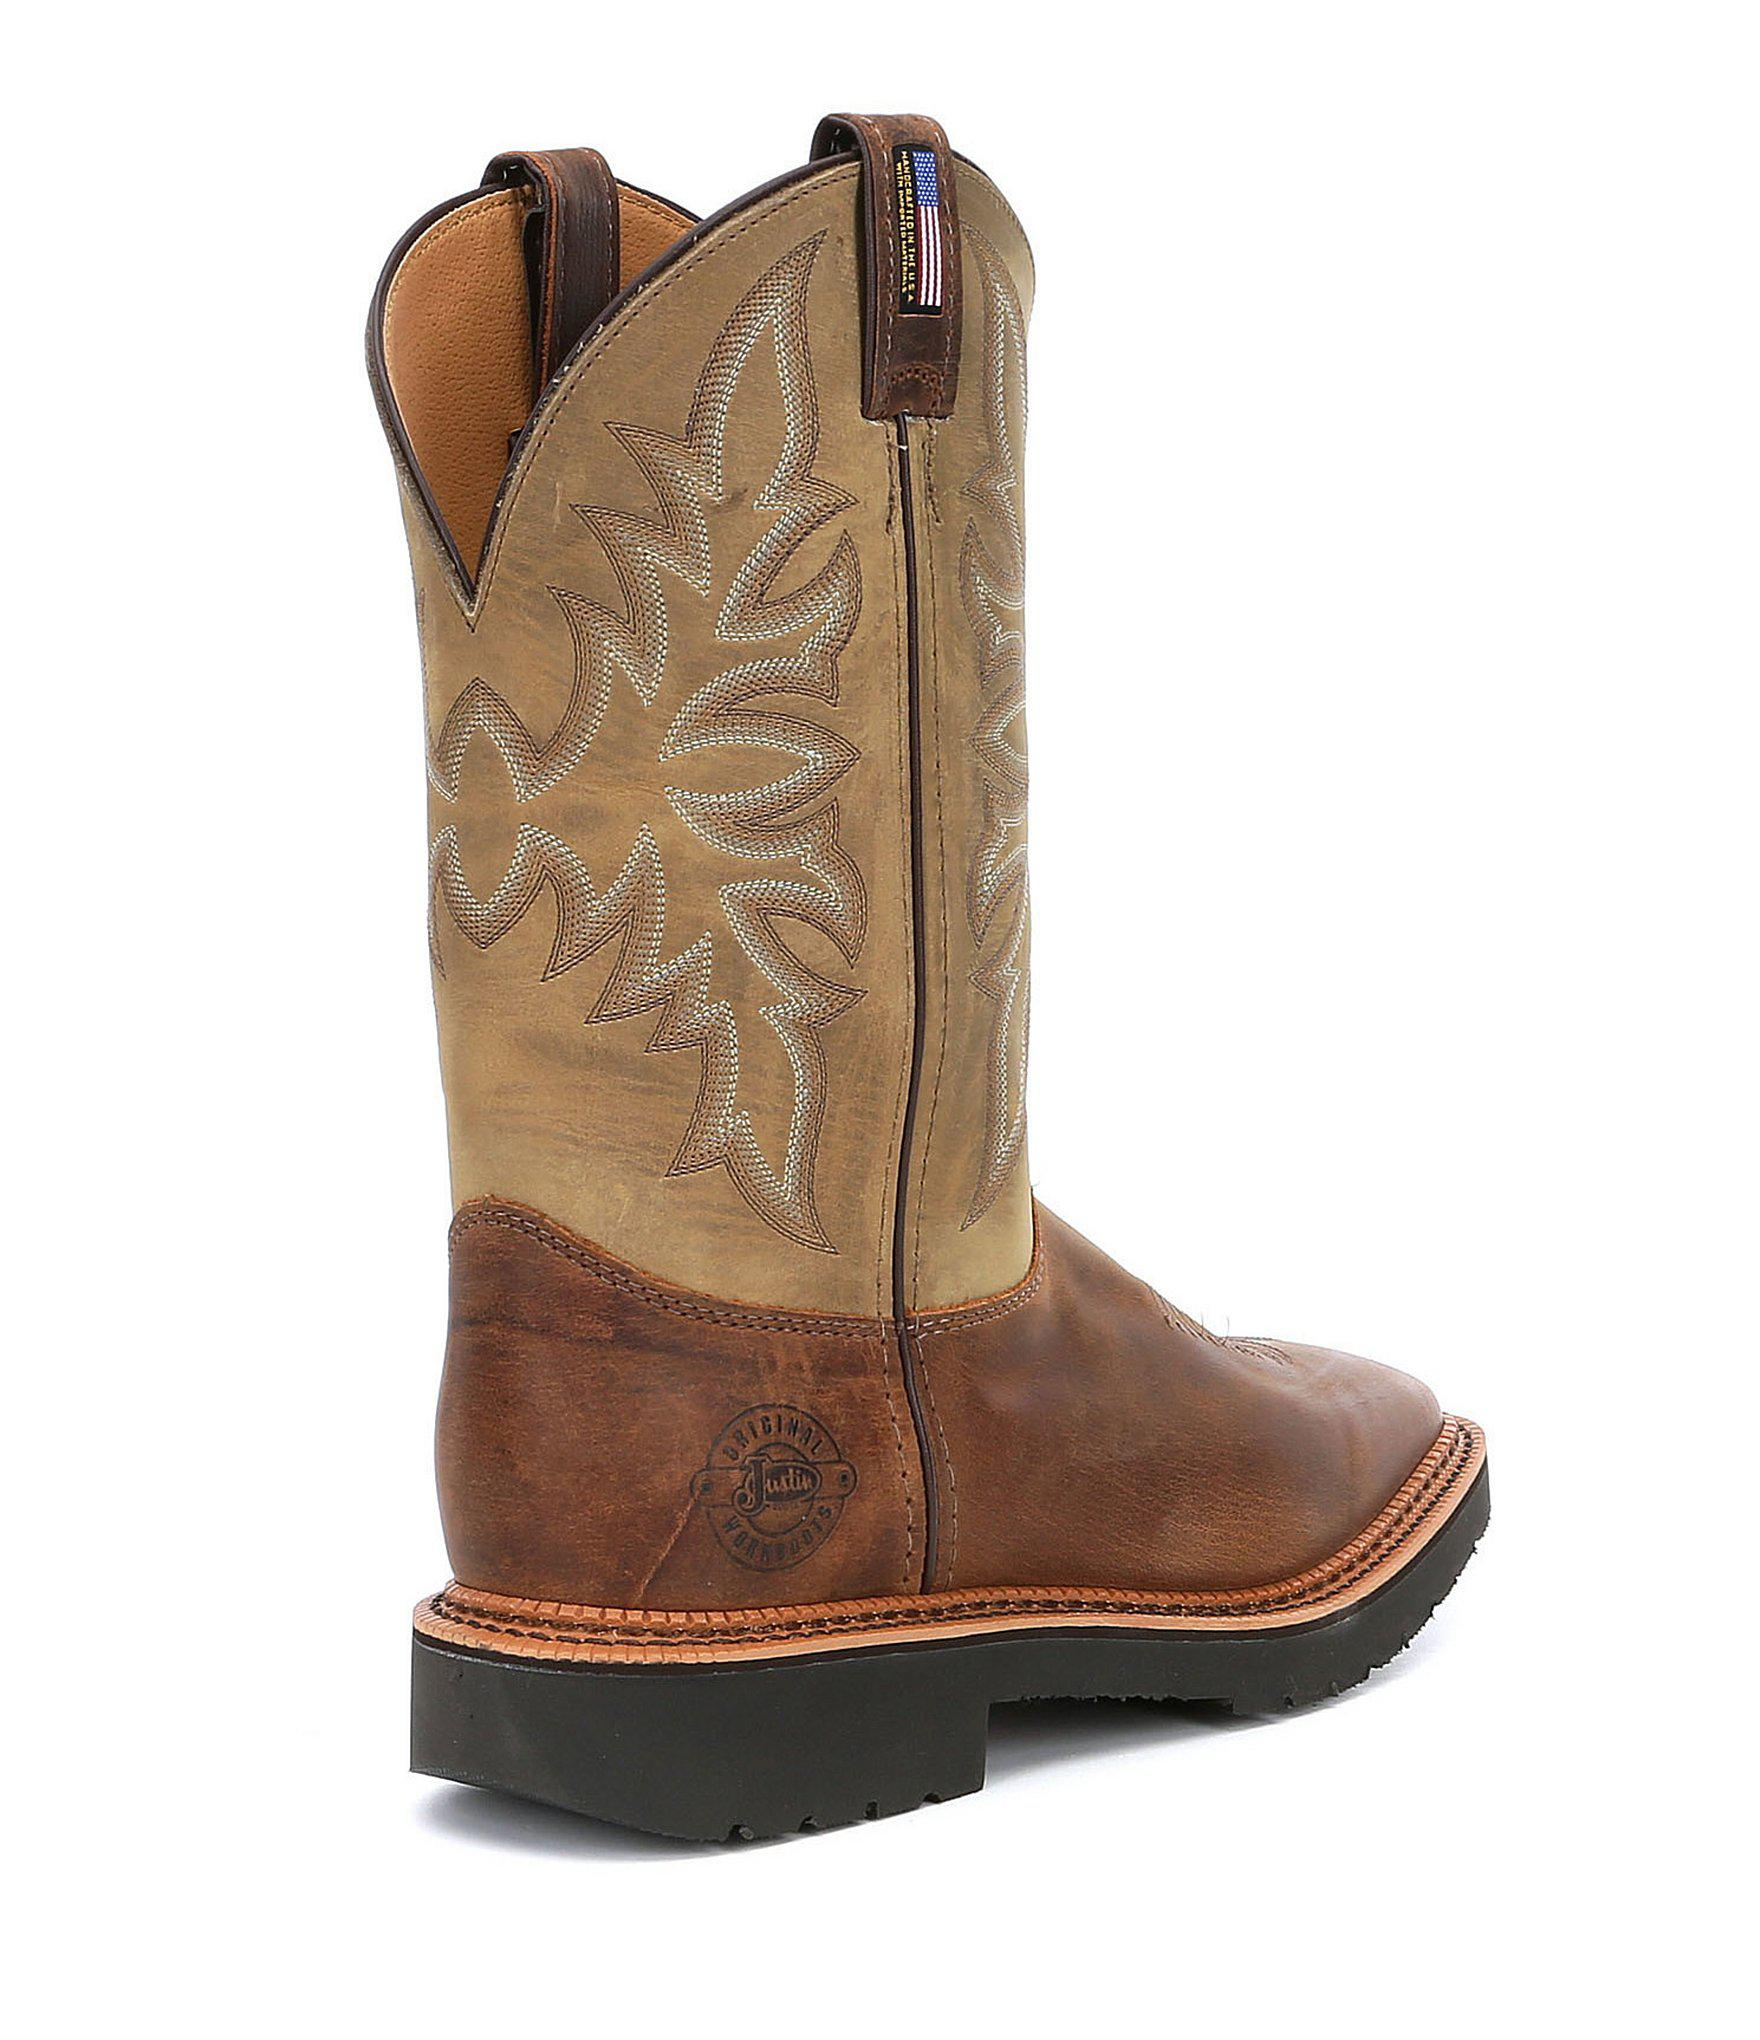 d73fdb67295 Brown Justin Original Work Boots Men's Scottsbluff Work Boots